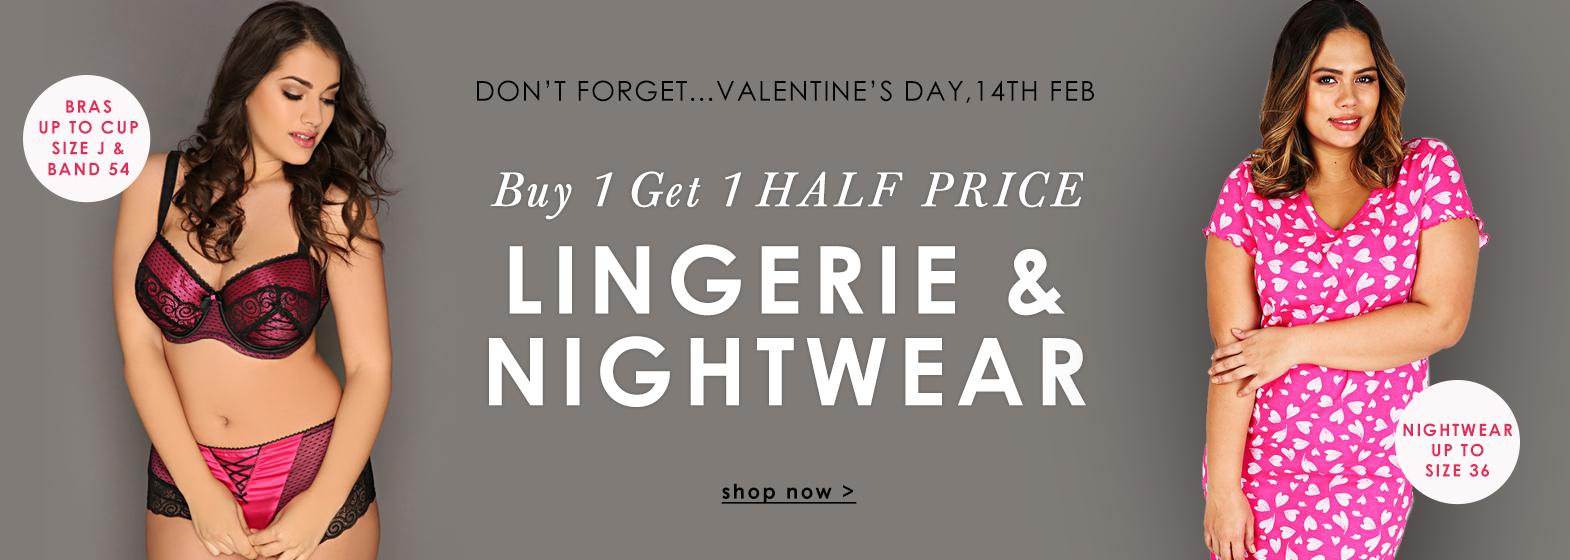 Buy 1 Get 1 Half Price >